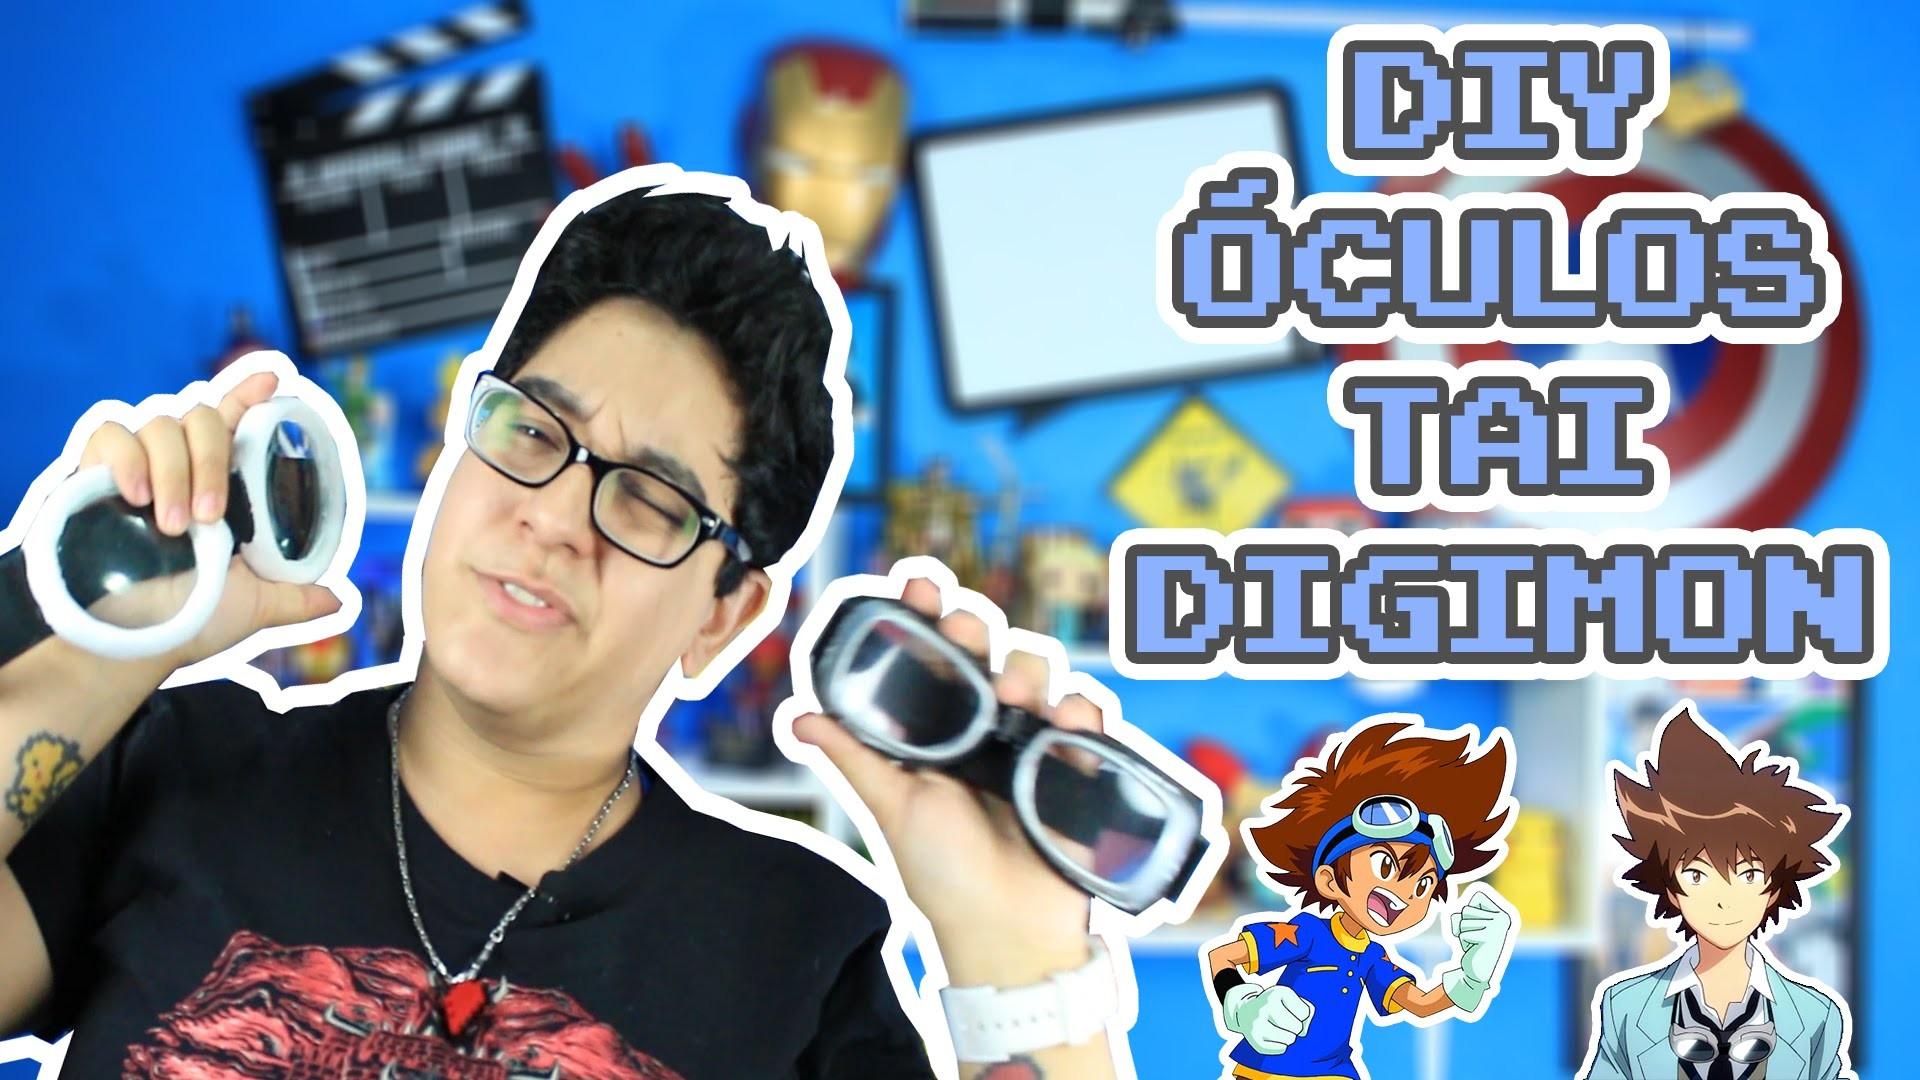 DIY ÓCULOS (GOGGLES) TAI DIGIMON   TiH Edition